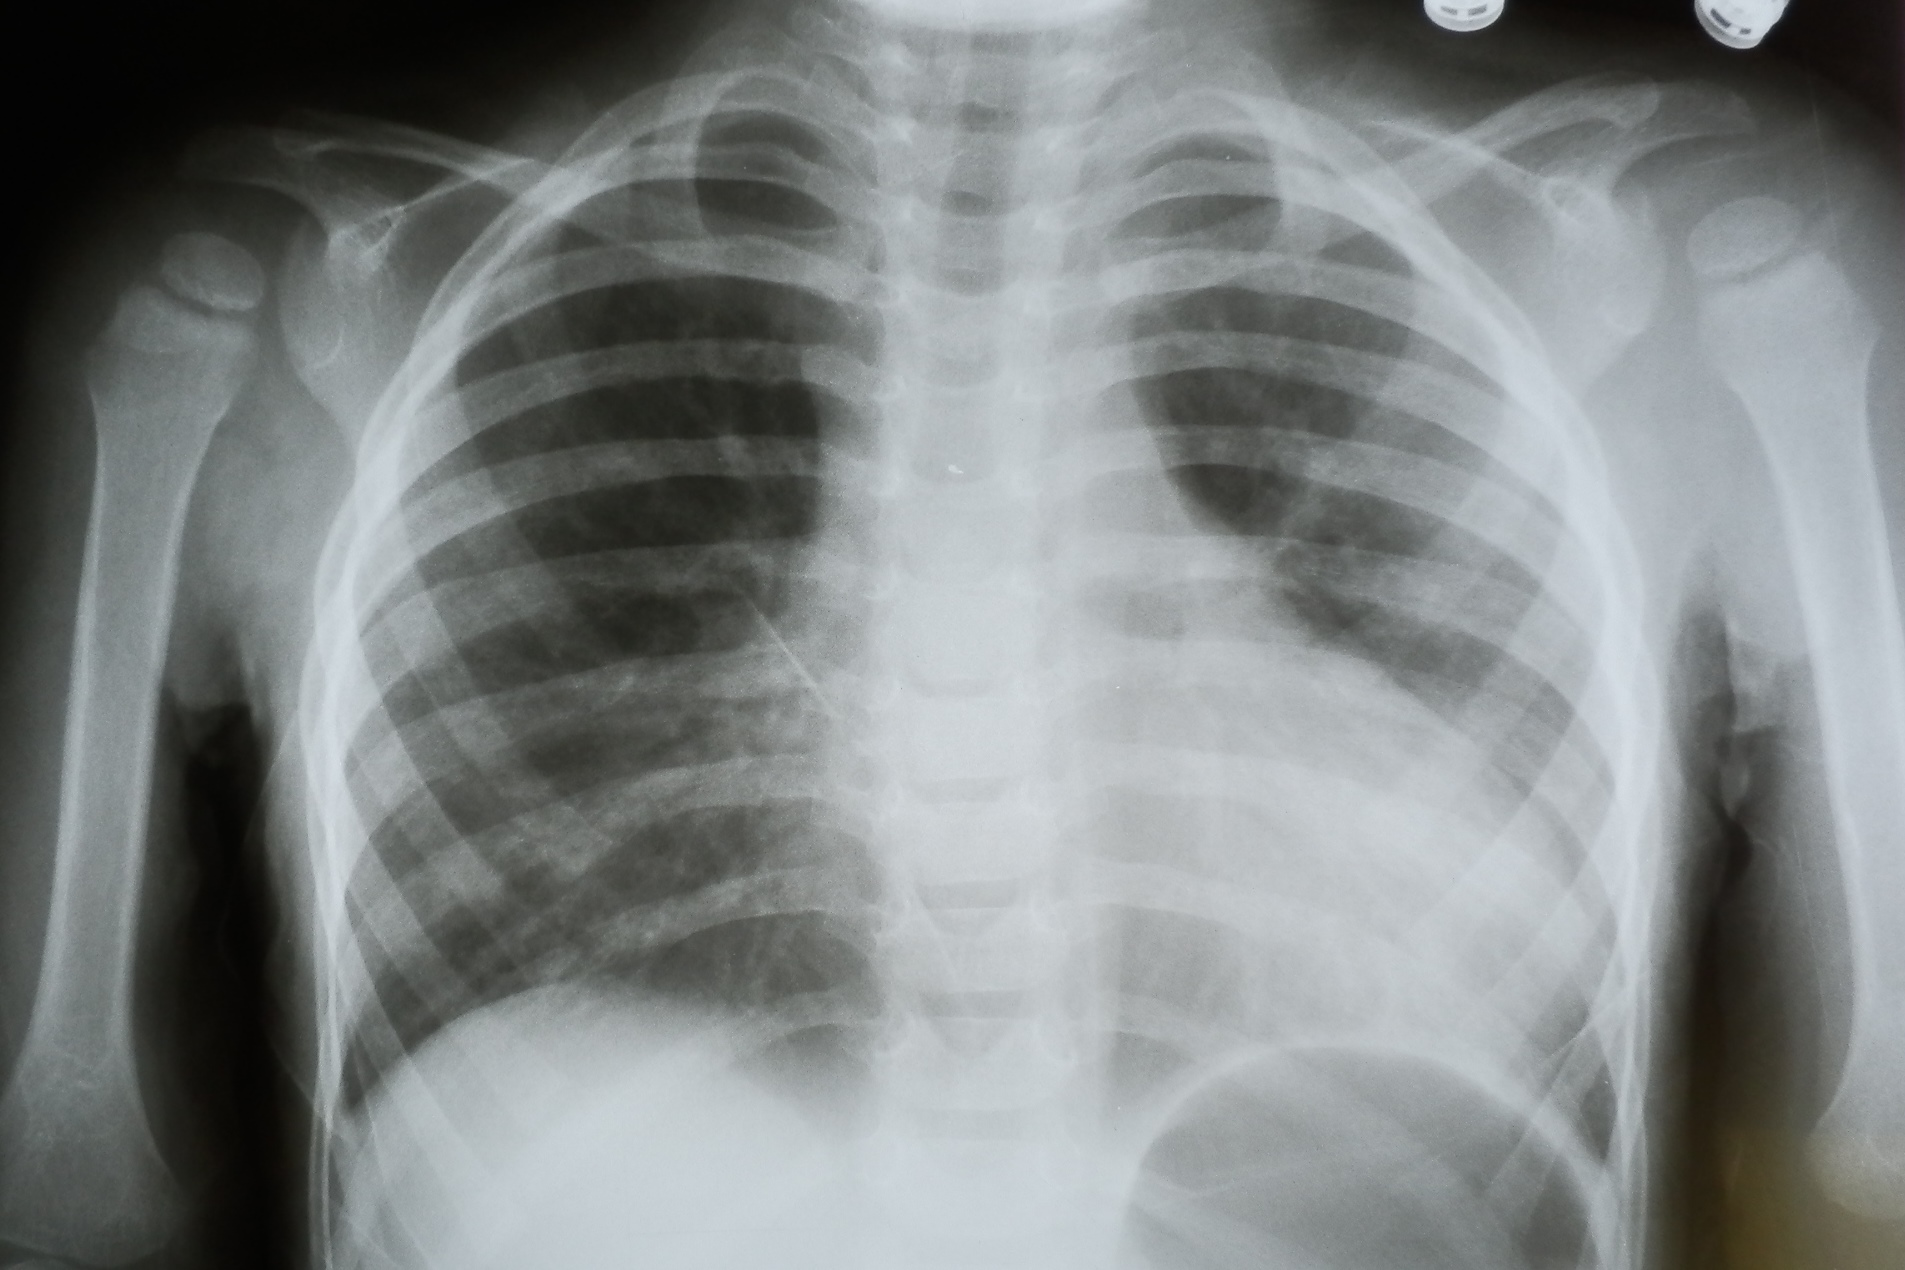 Фото рентгена грудной клетки ребенка